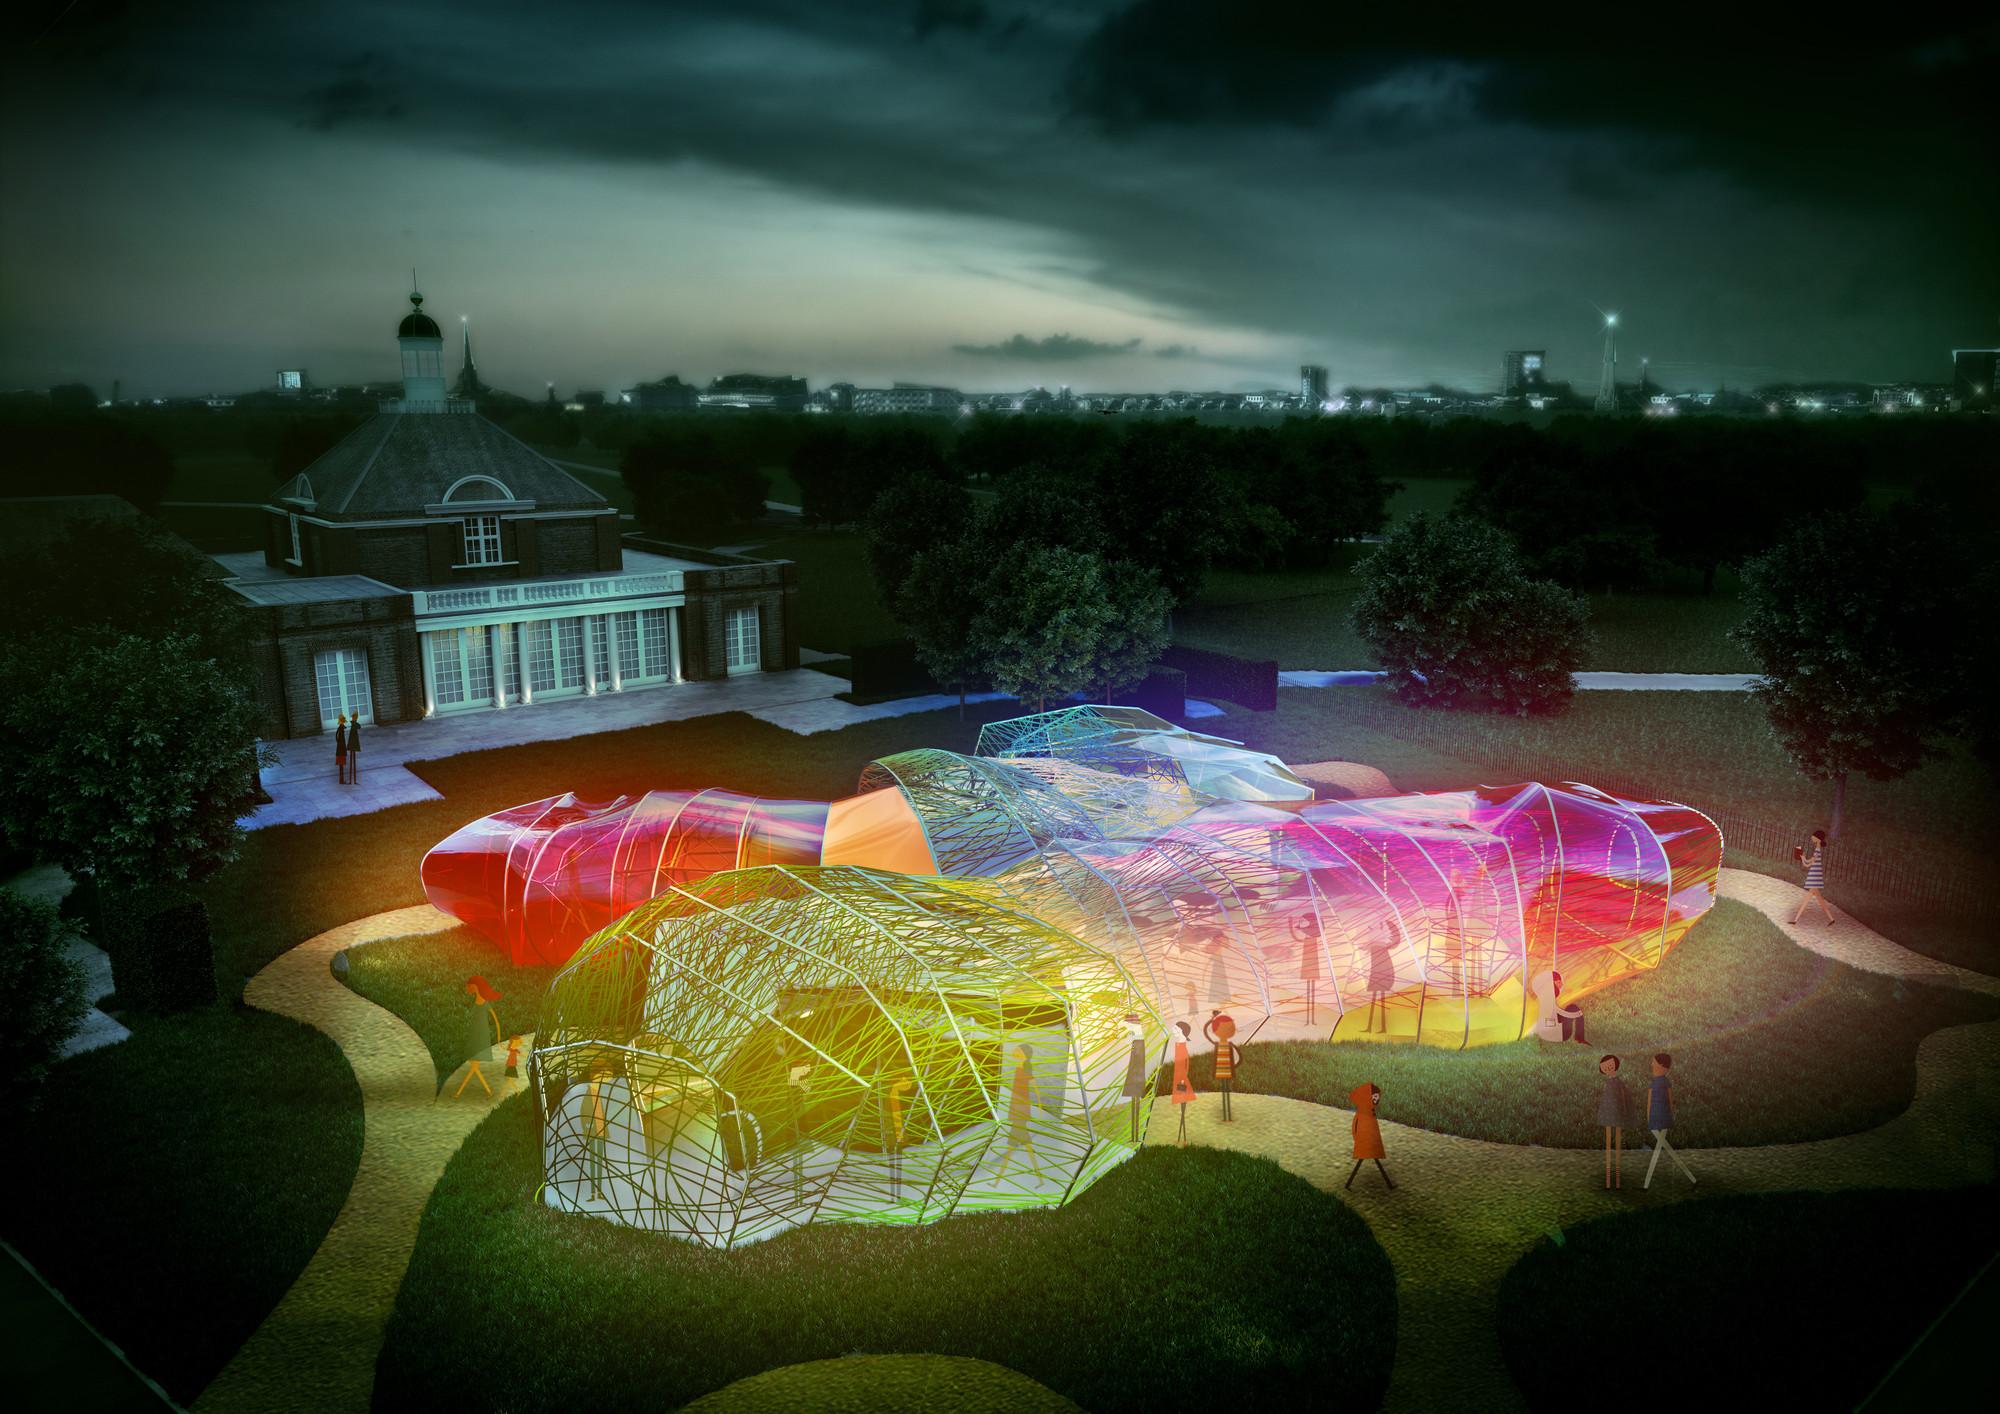 Serpentine Pavilion diseñado por SelgasCano 2015: vista nocturna. Imagen © Steven Kevin Howson / SelgasCano